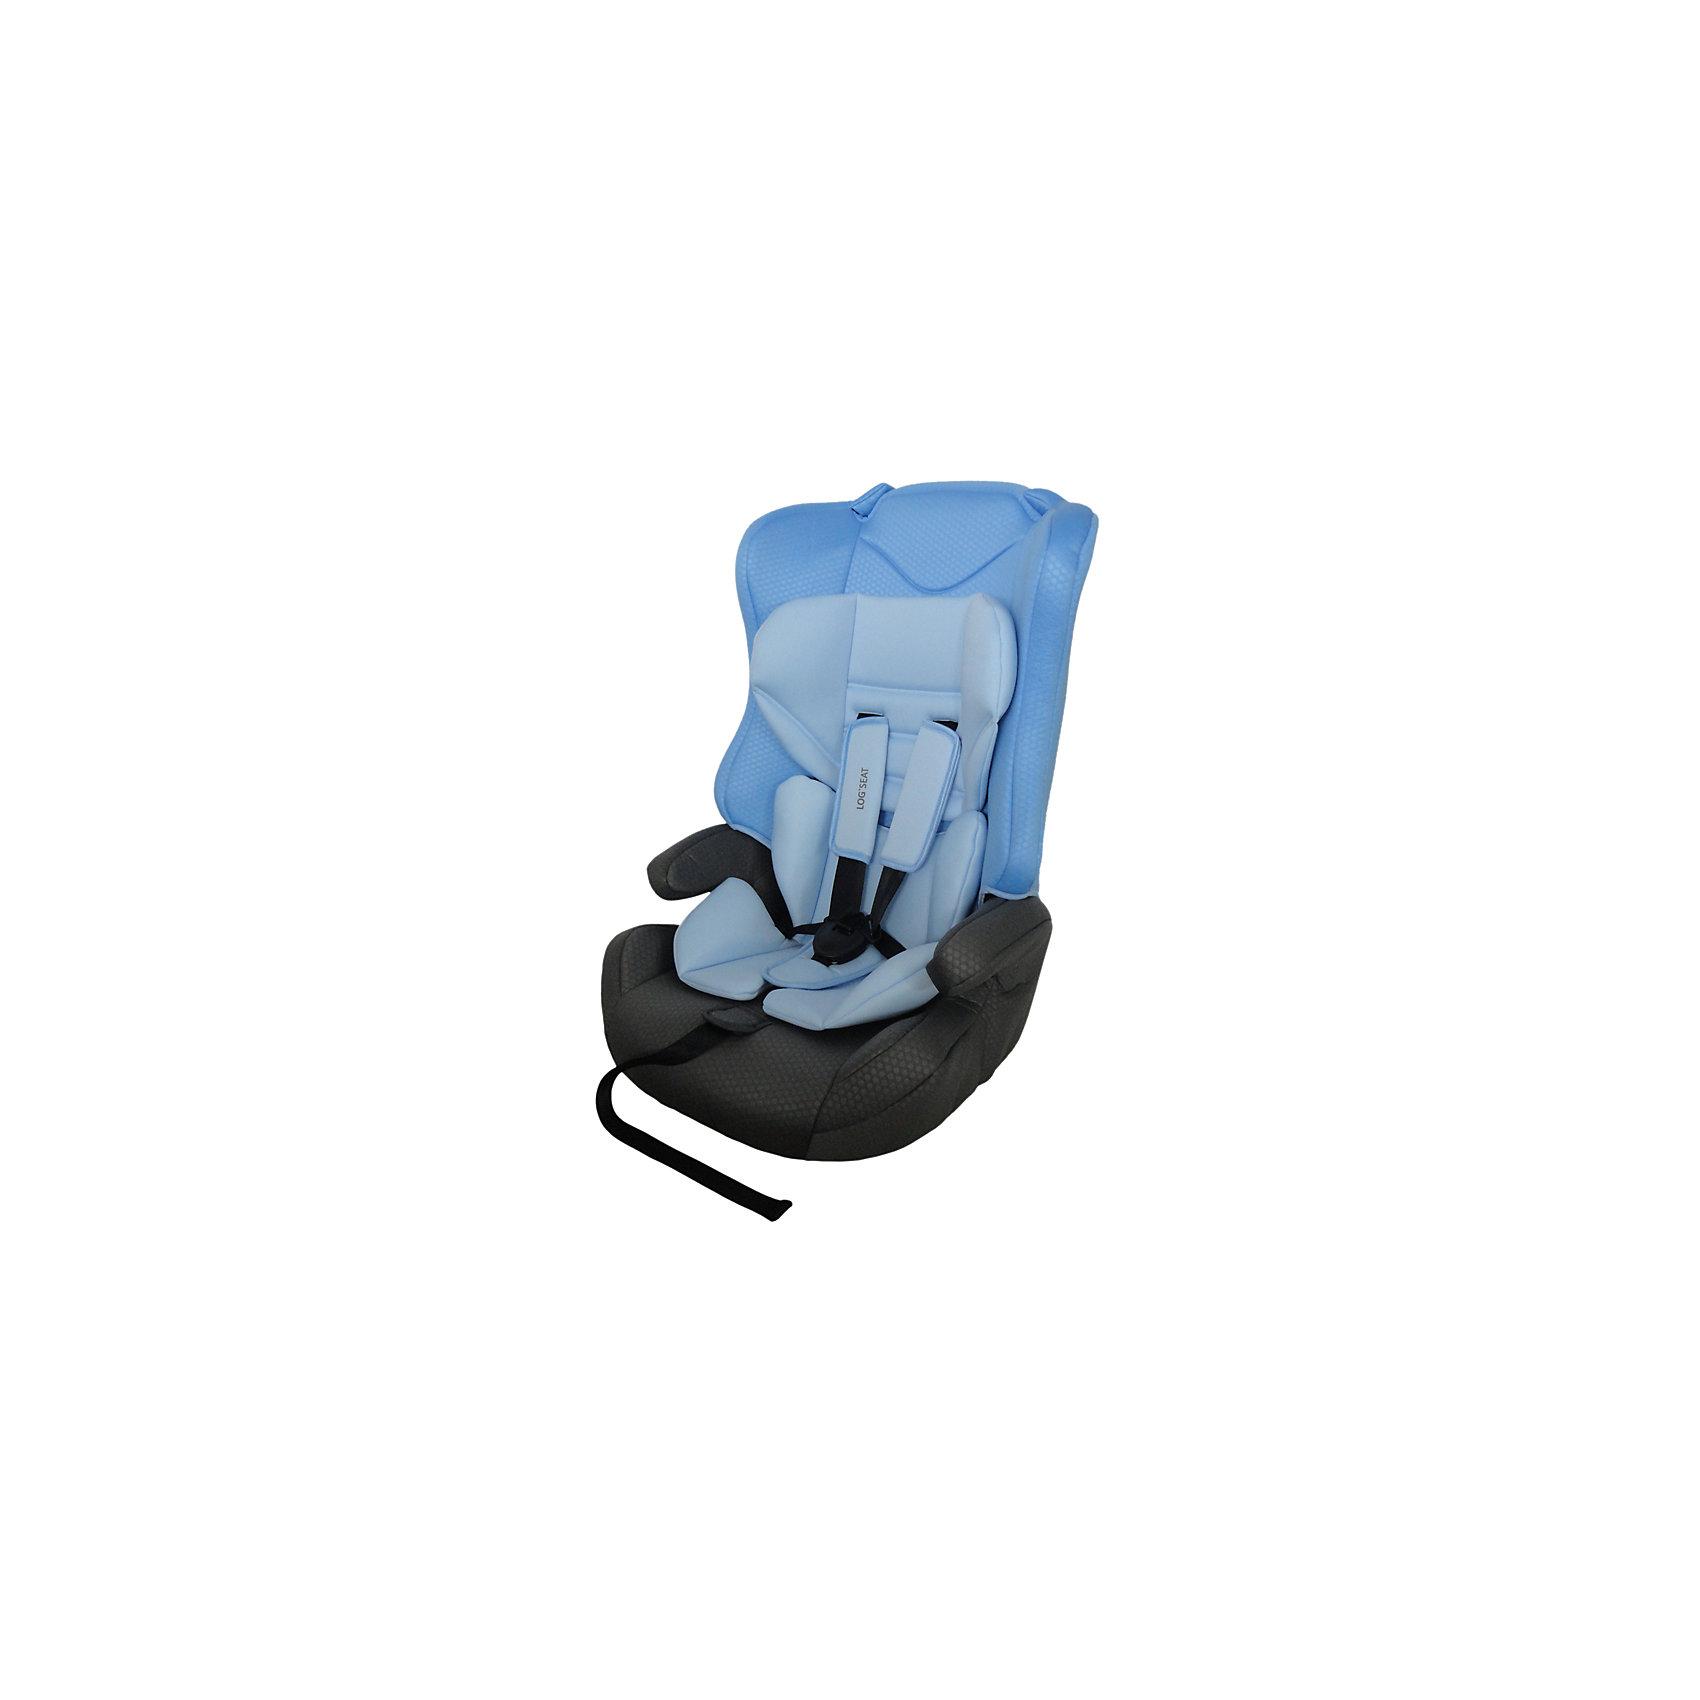 Baby Hit Автокресло Log's Seat 9-36 кг., Babyhit, серо-голубой roswheel mtb road bike bag touchscreen bicycle saddle bag for 5 5 7 phone cycling front frame tube bag bicycle accessories